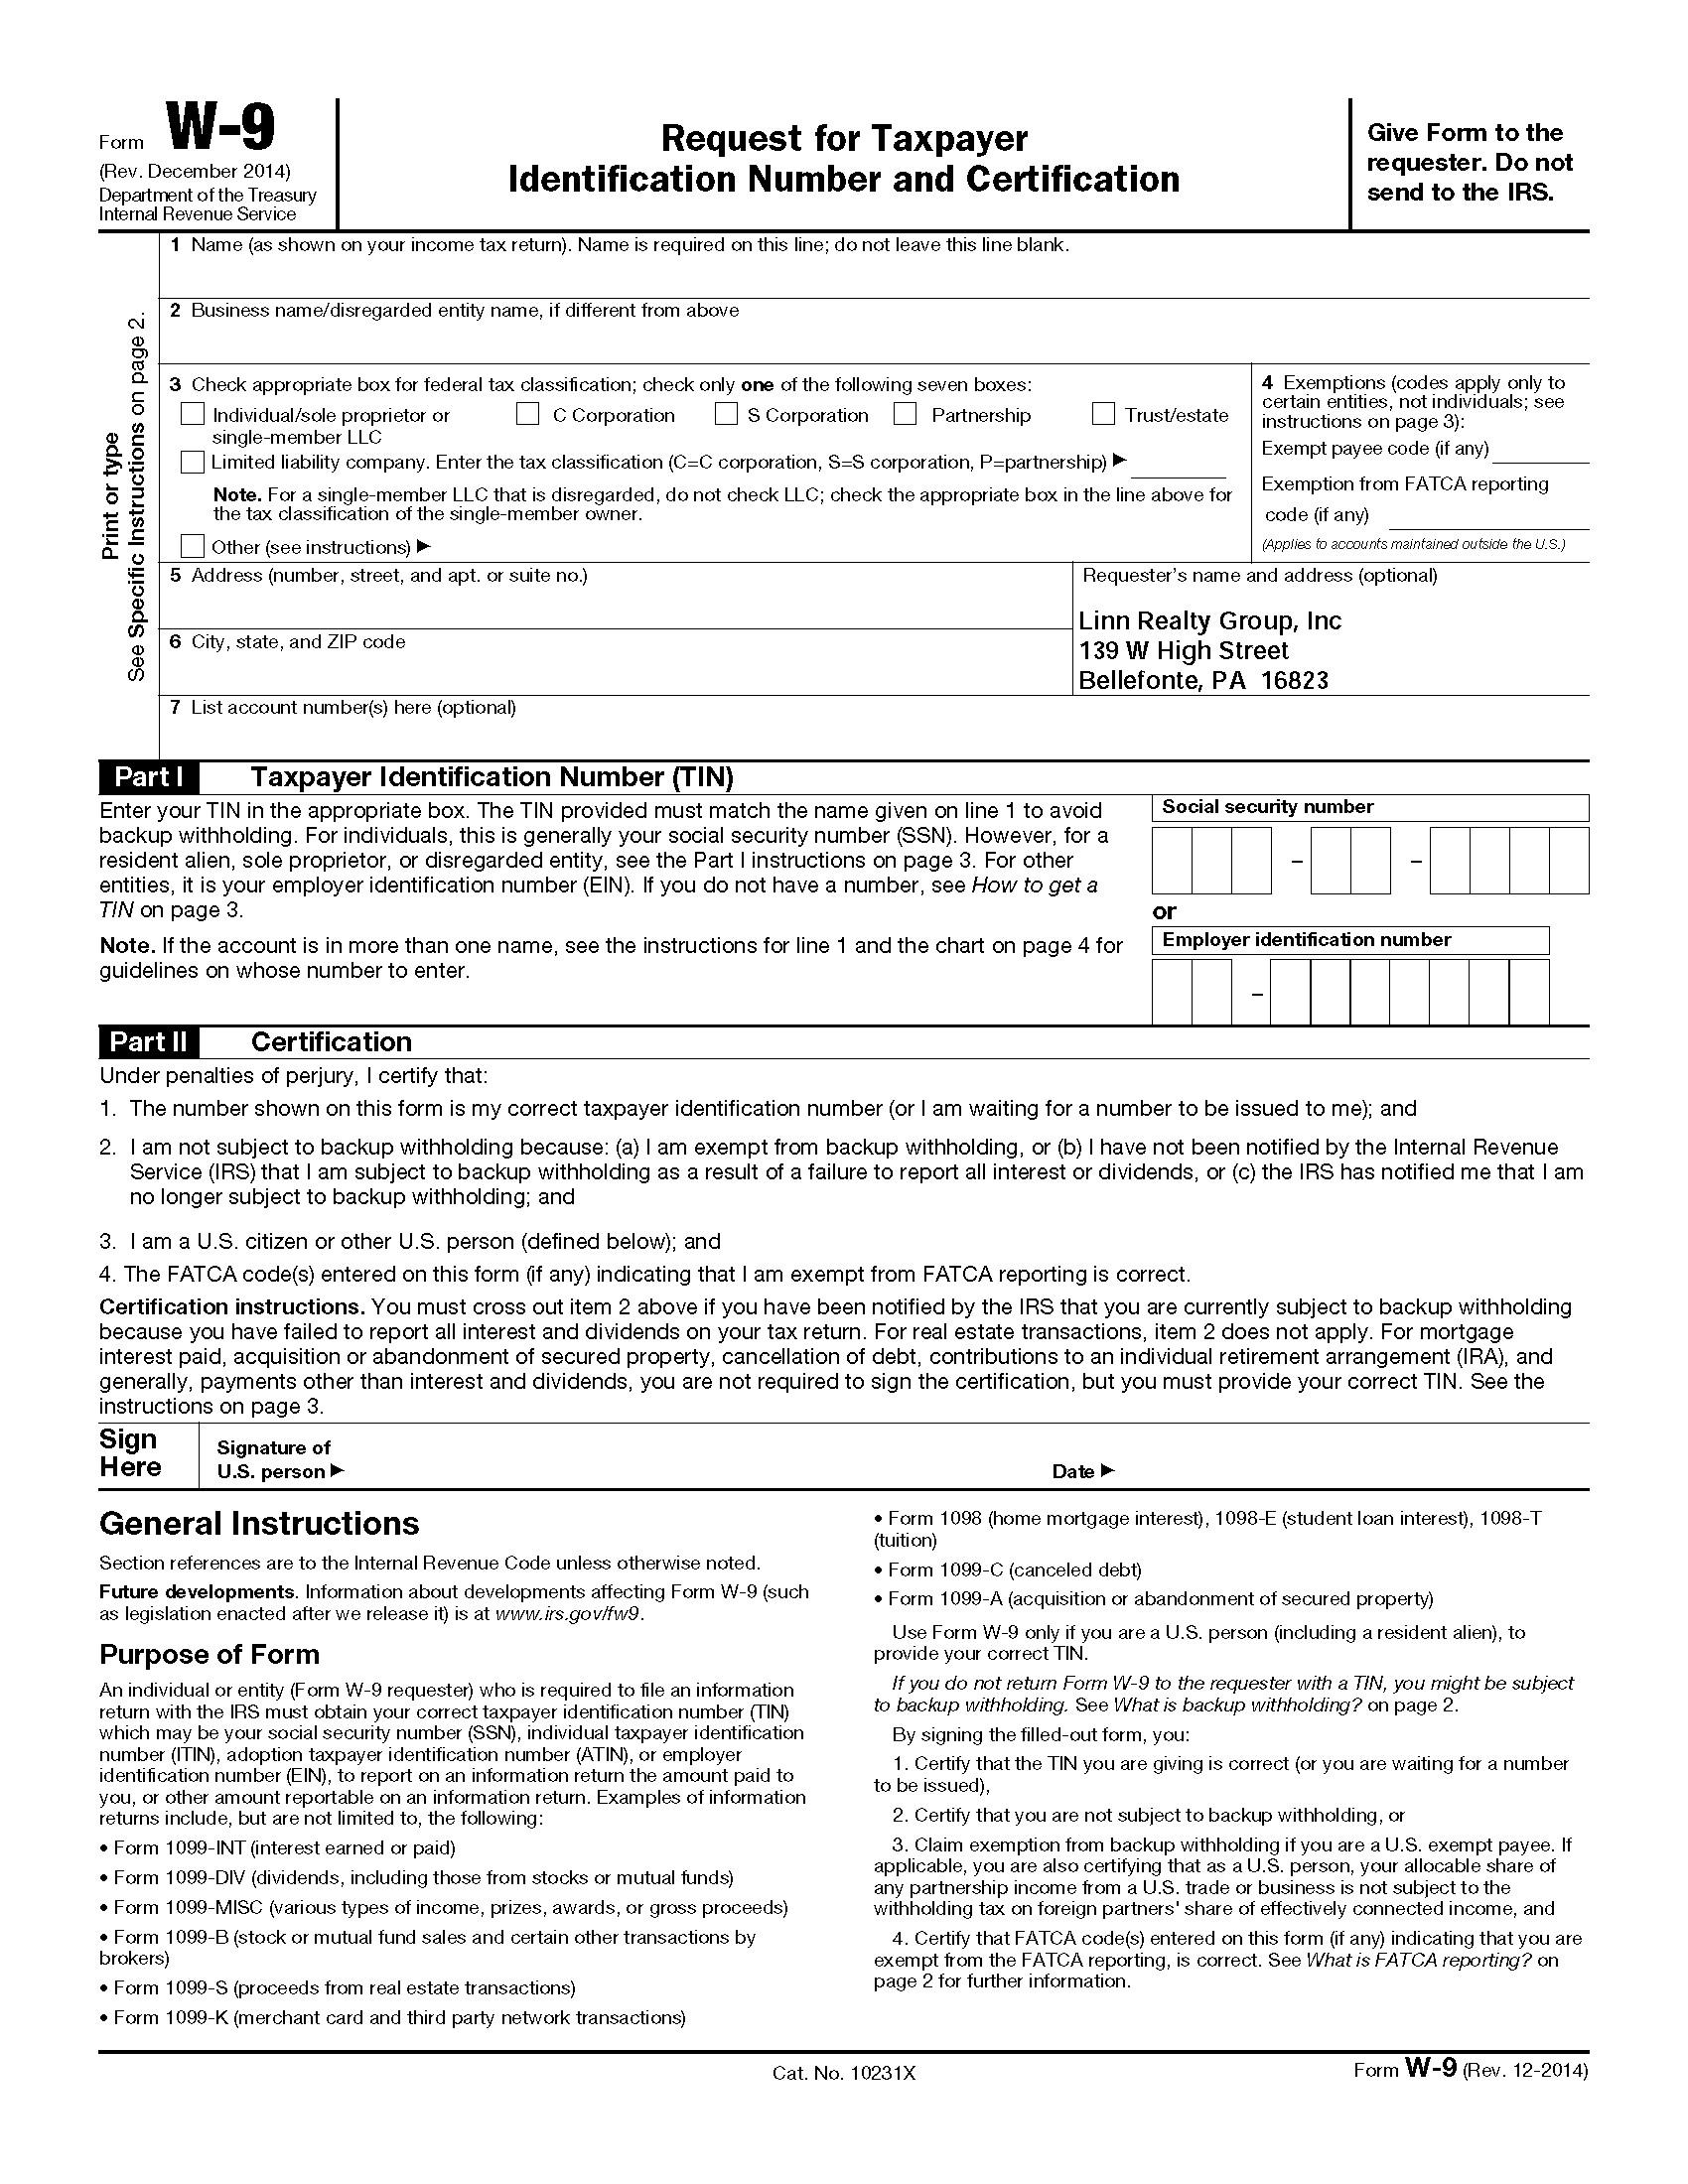 Blank W-9 Form 2020 Pdf | Calendar Template Printable